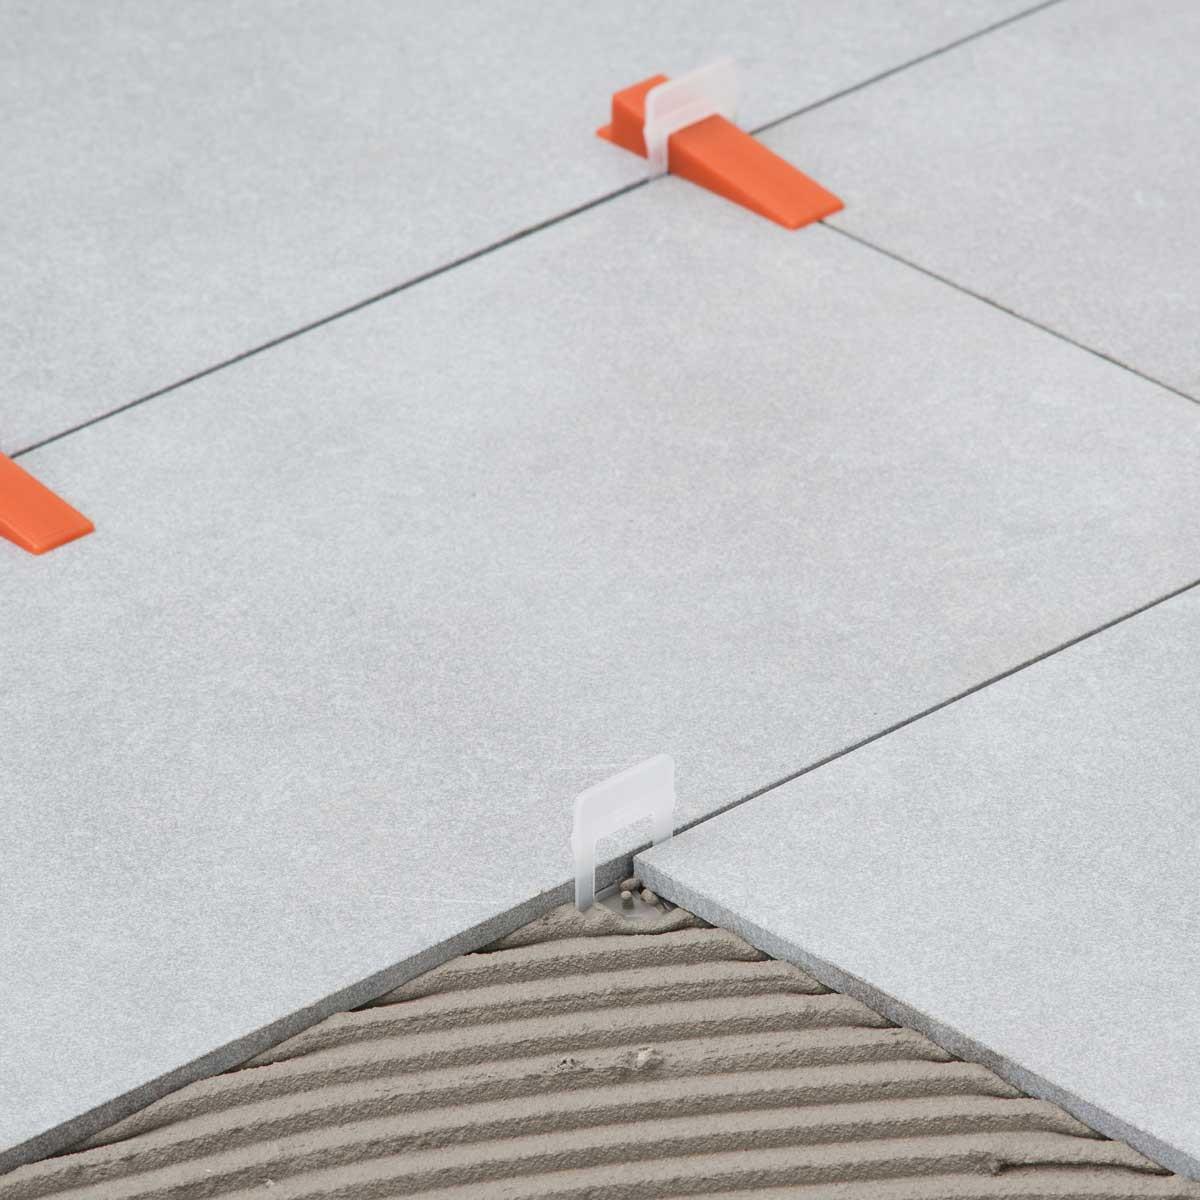 Raimondi Leveling Spacers floor tile installation